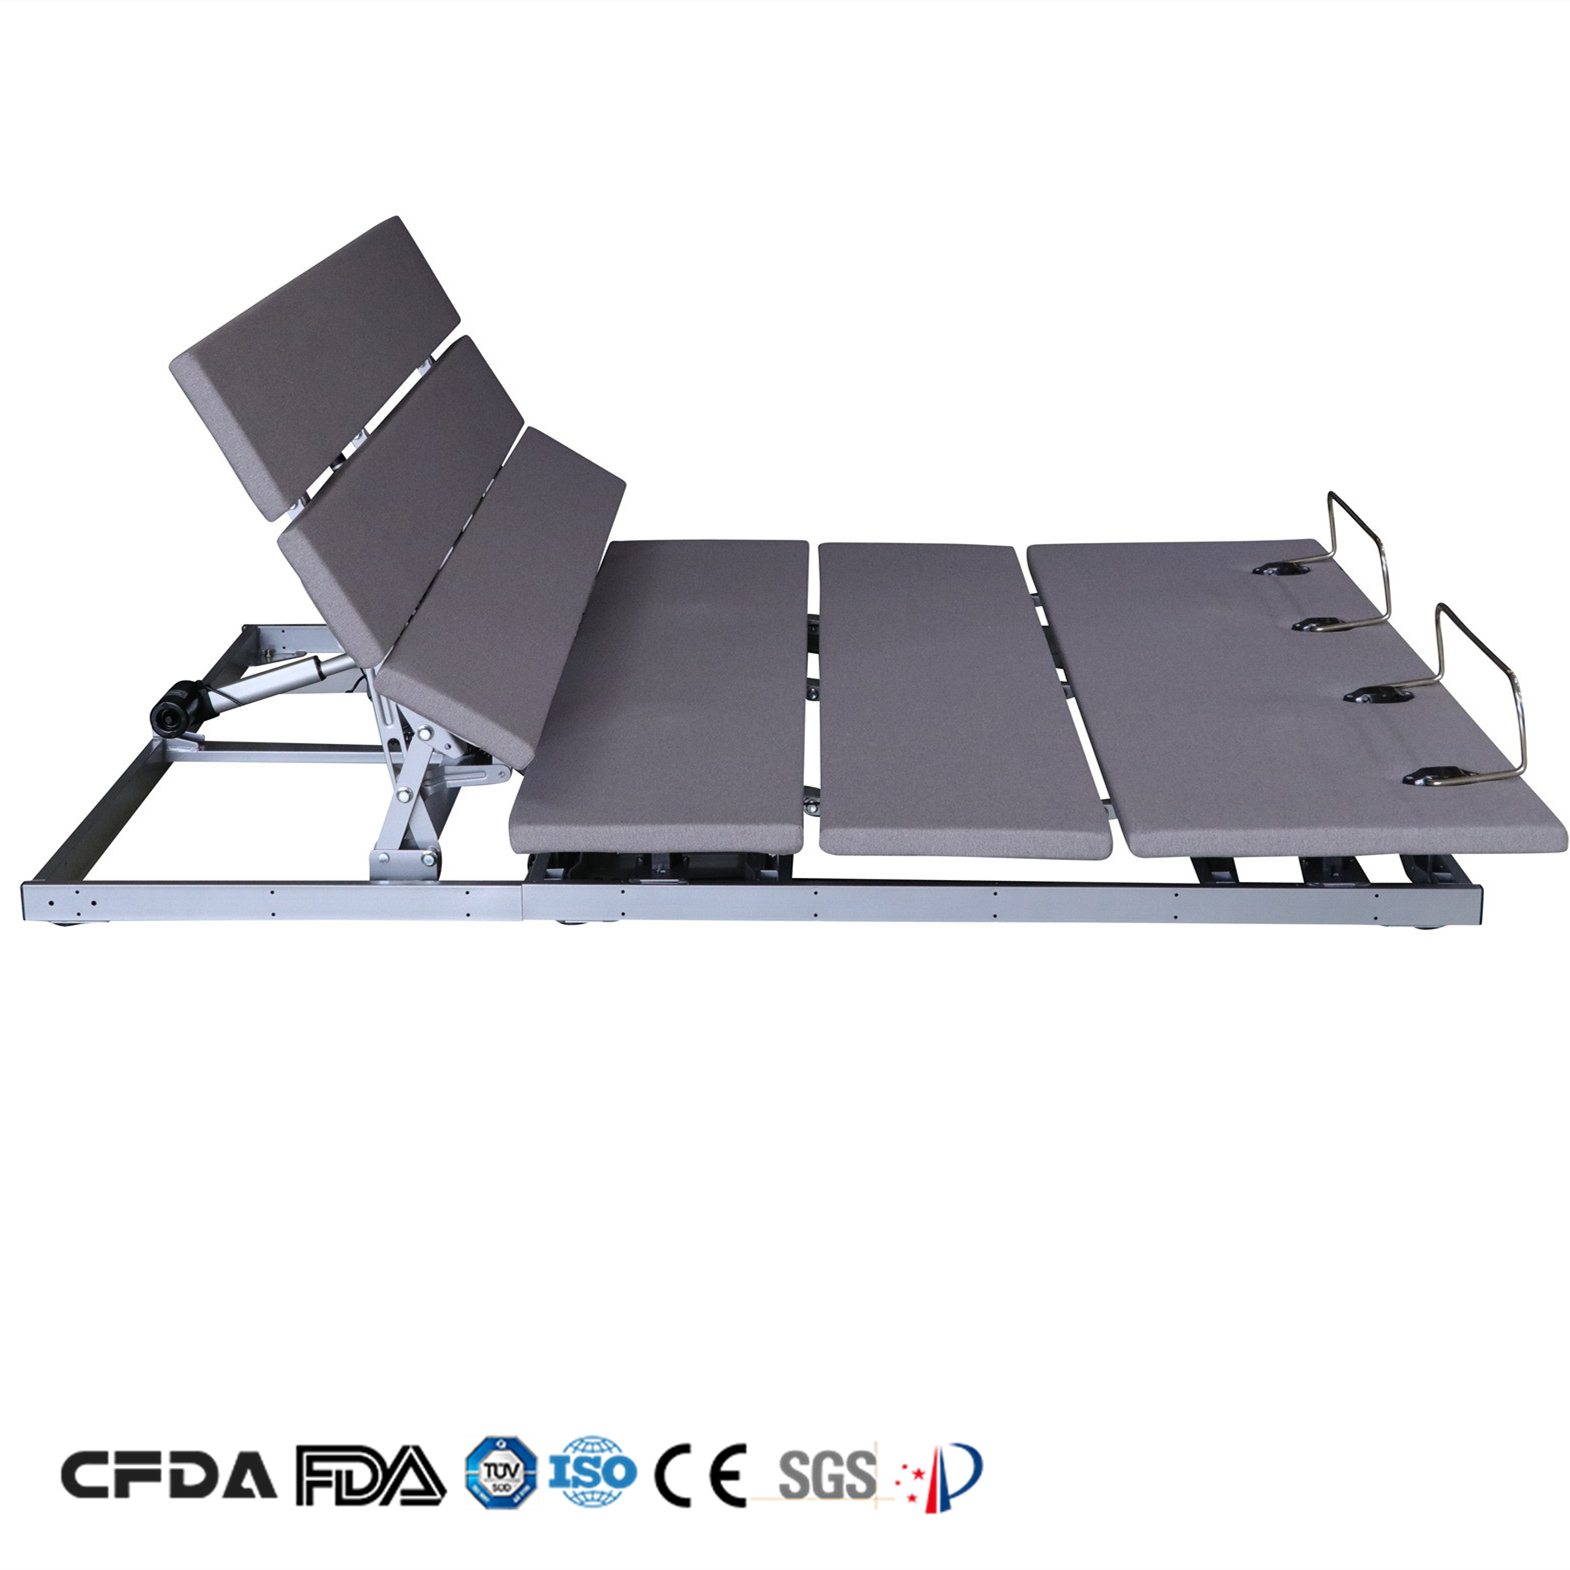 Free Design L040 multi function tv reading luxury metal modern hotel bed frame for sale